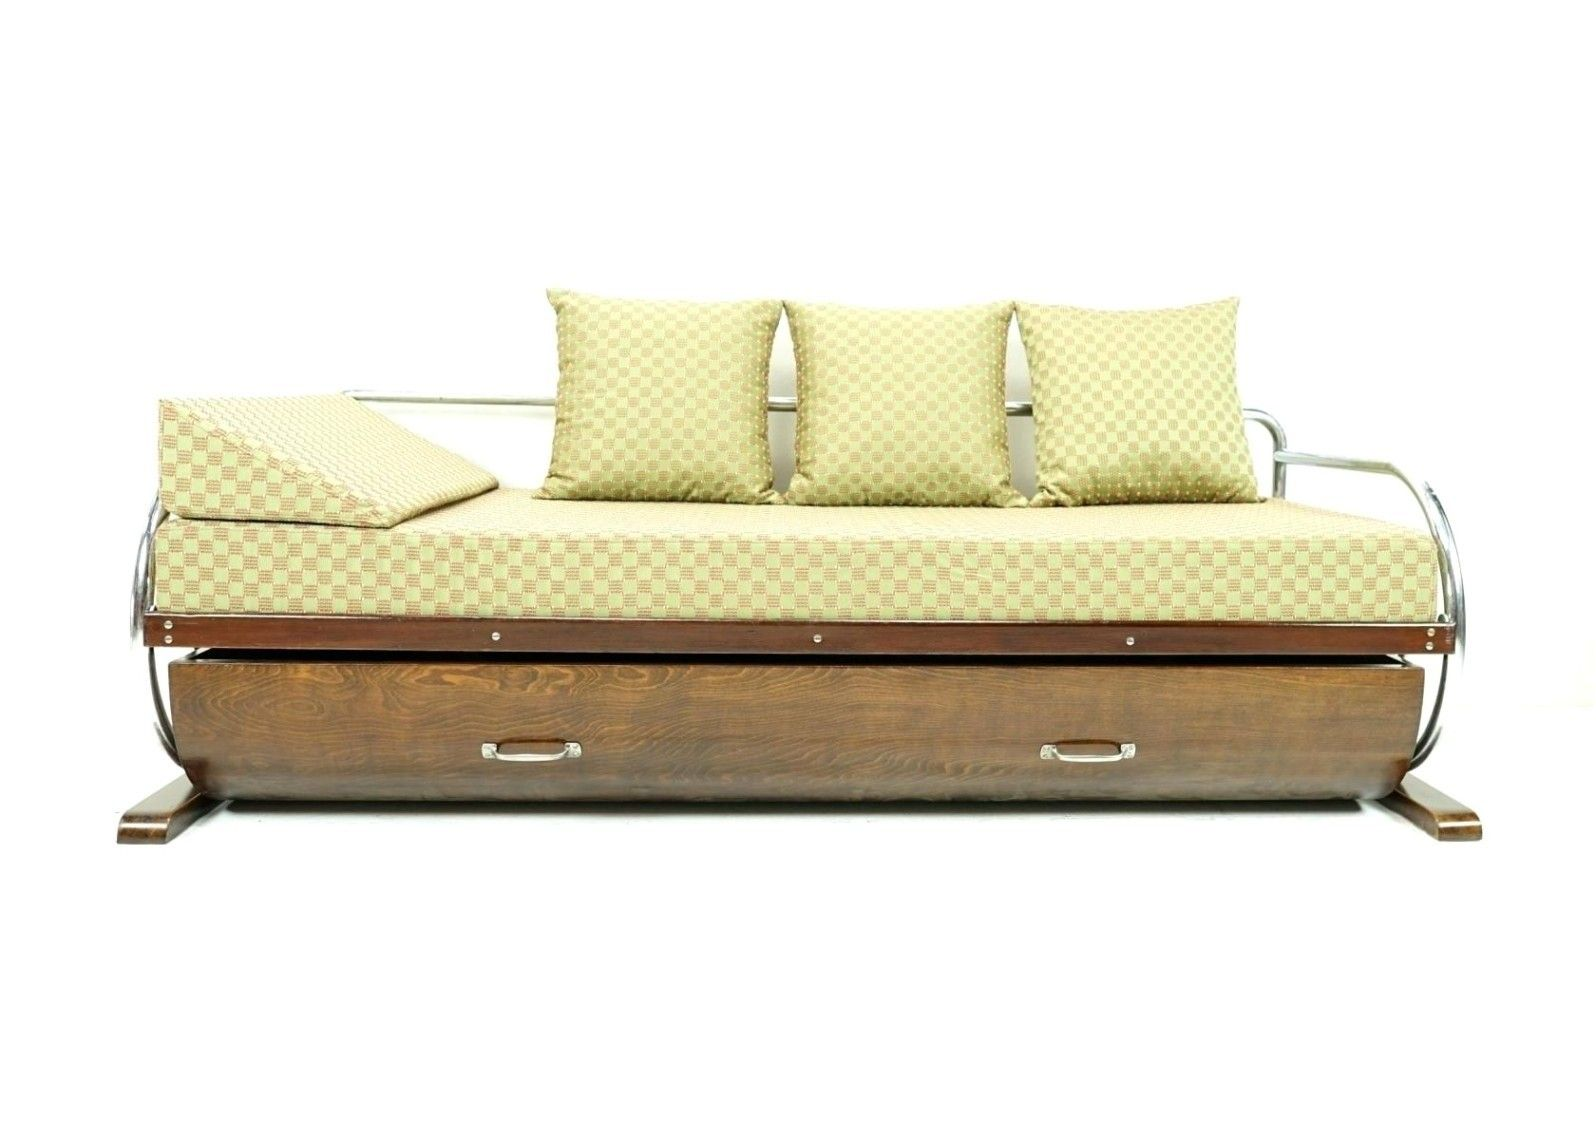 orange leather sofa sofa ikea beste landhaus schlafsofa 0d archives galerie schlafsofa orange leather sofa